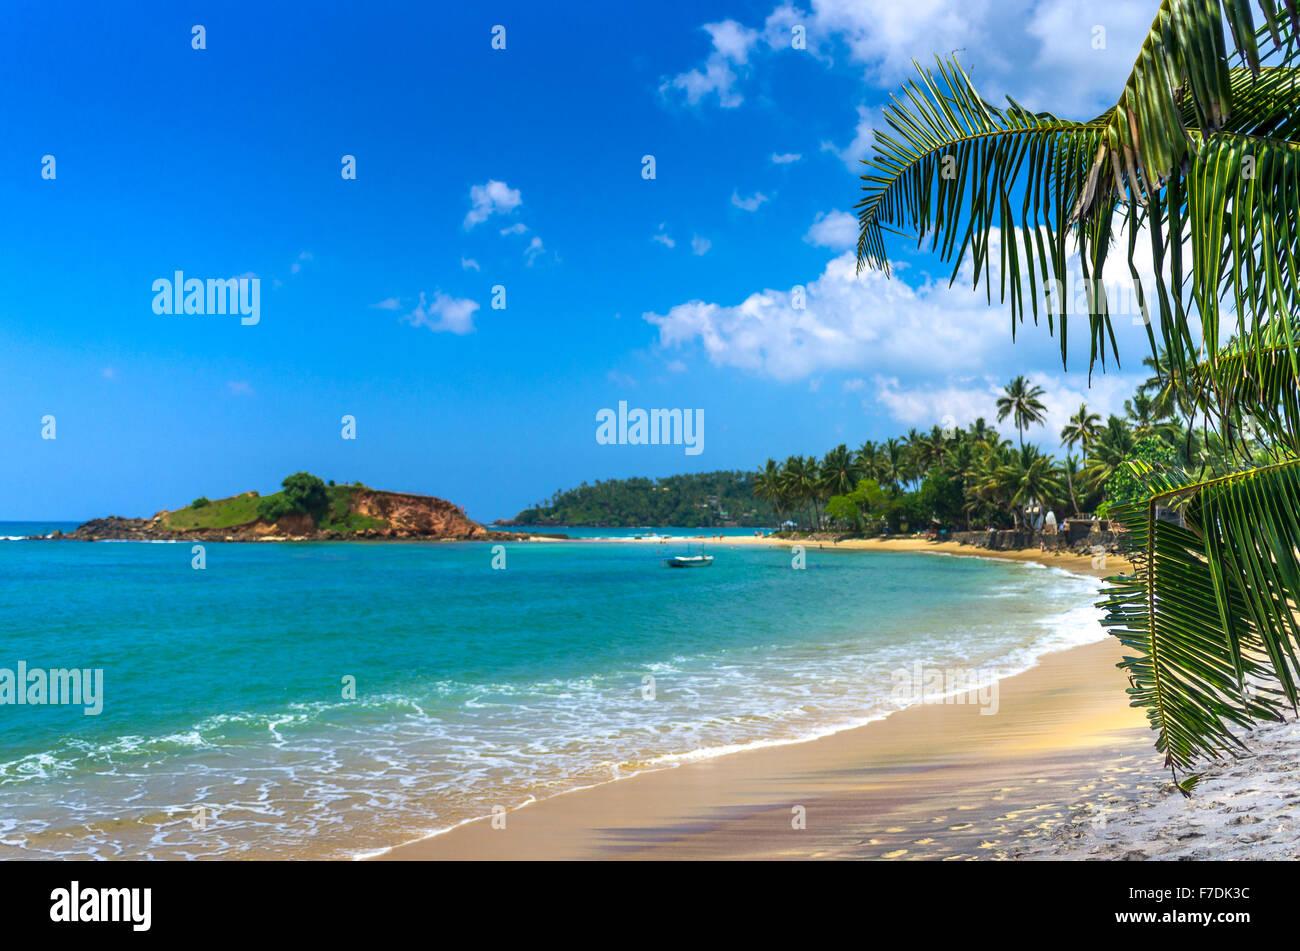 Tropical beach in Sri Lanka - Stock Image